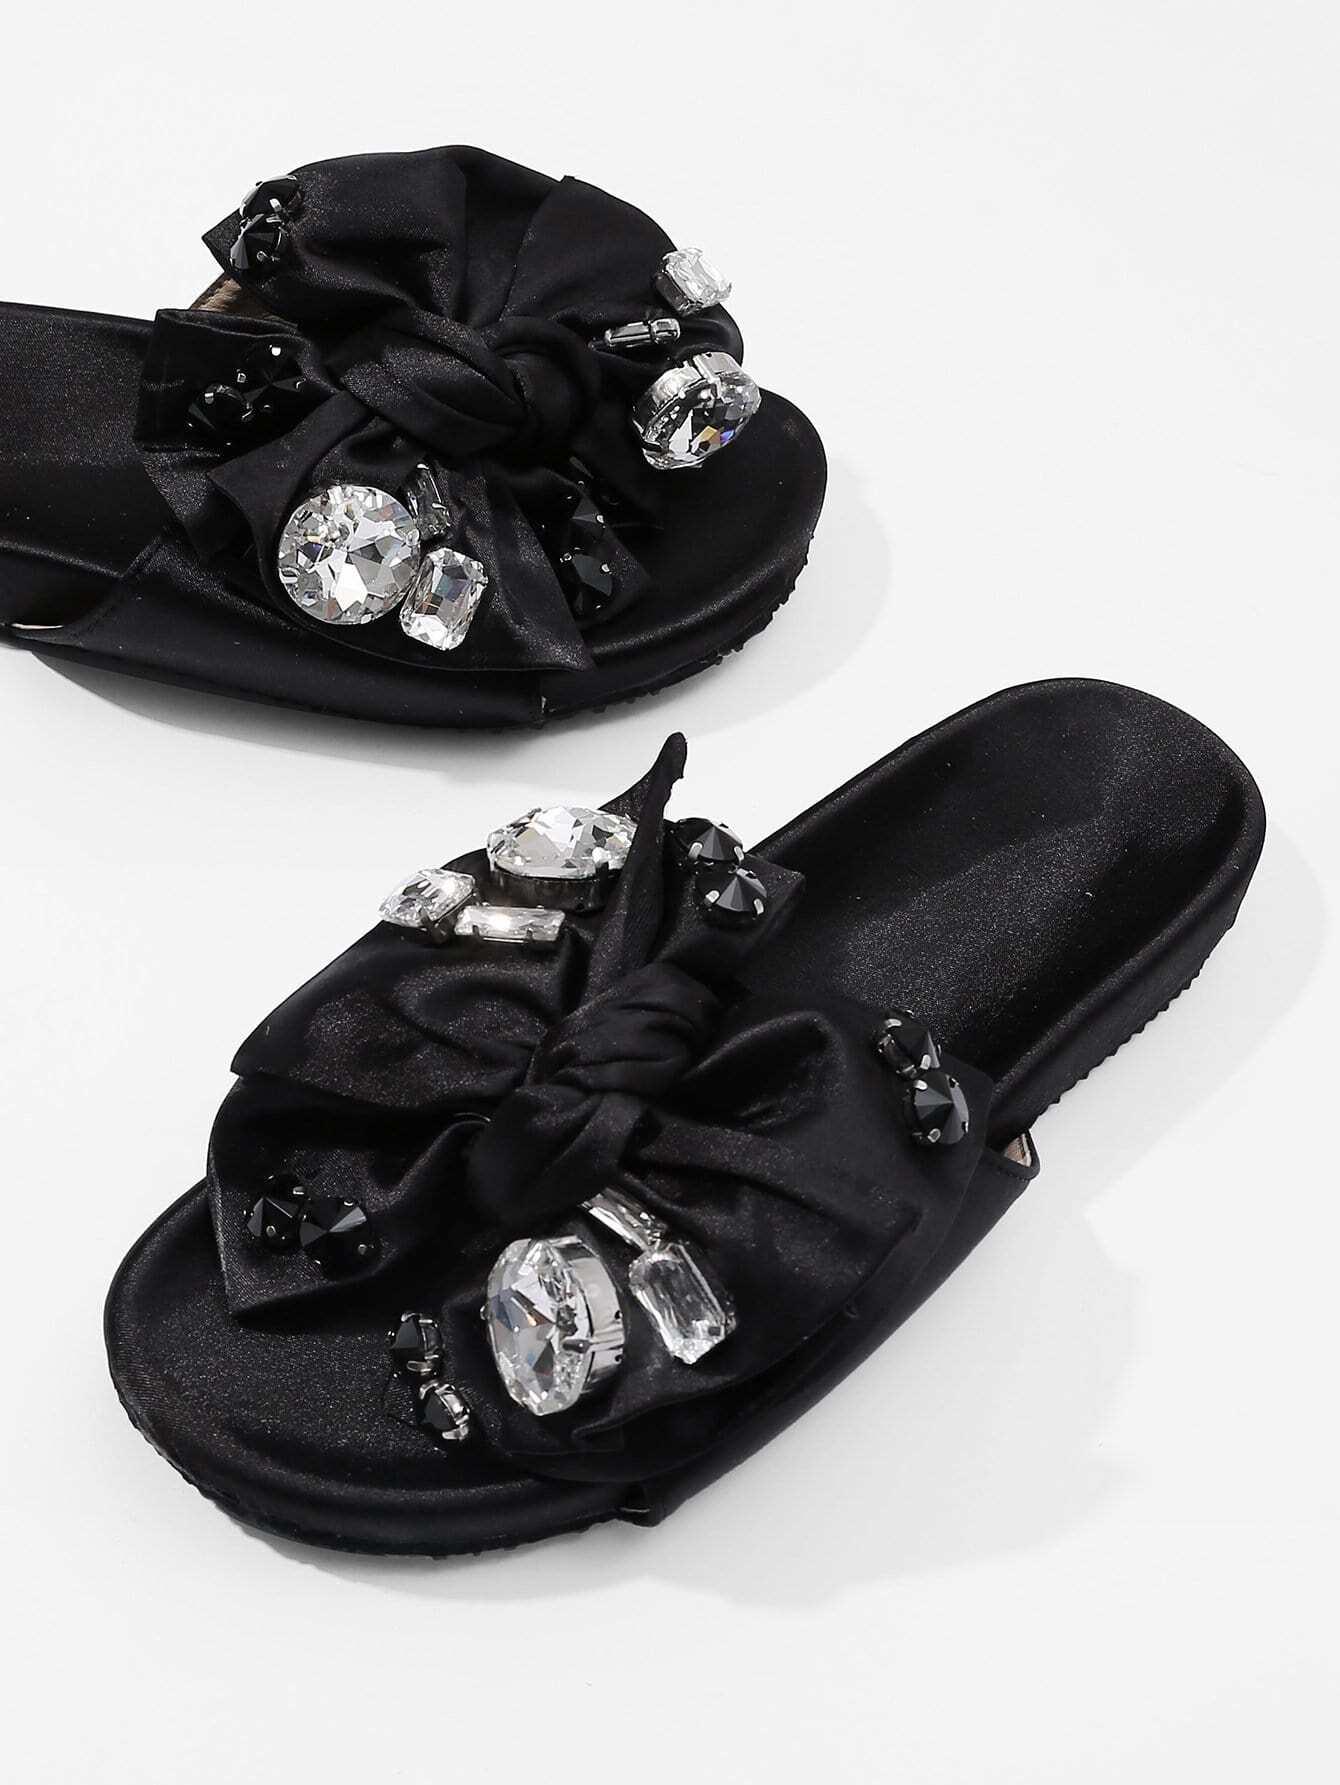 Купить Лук дизайн плоские сандалии с Rhinestone, null, SheIn